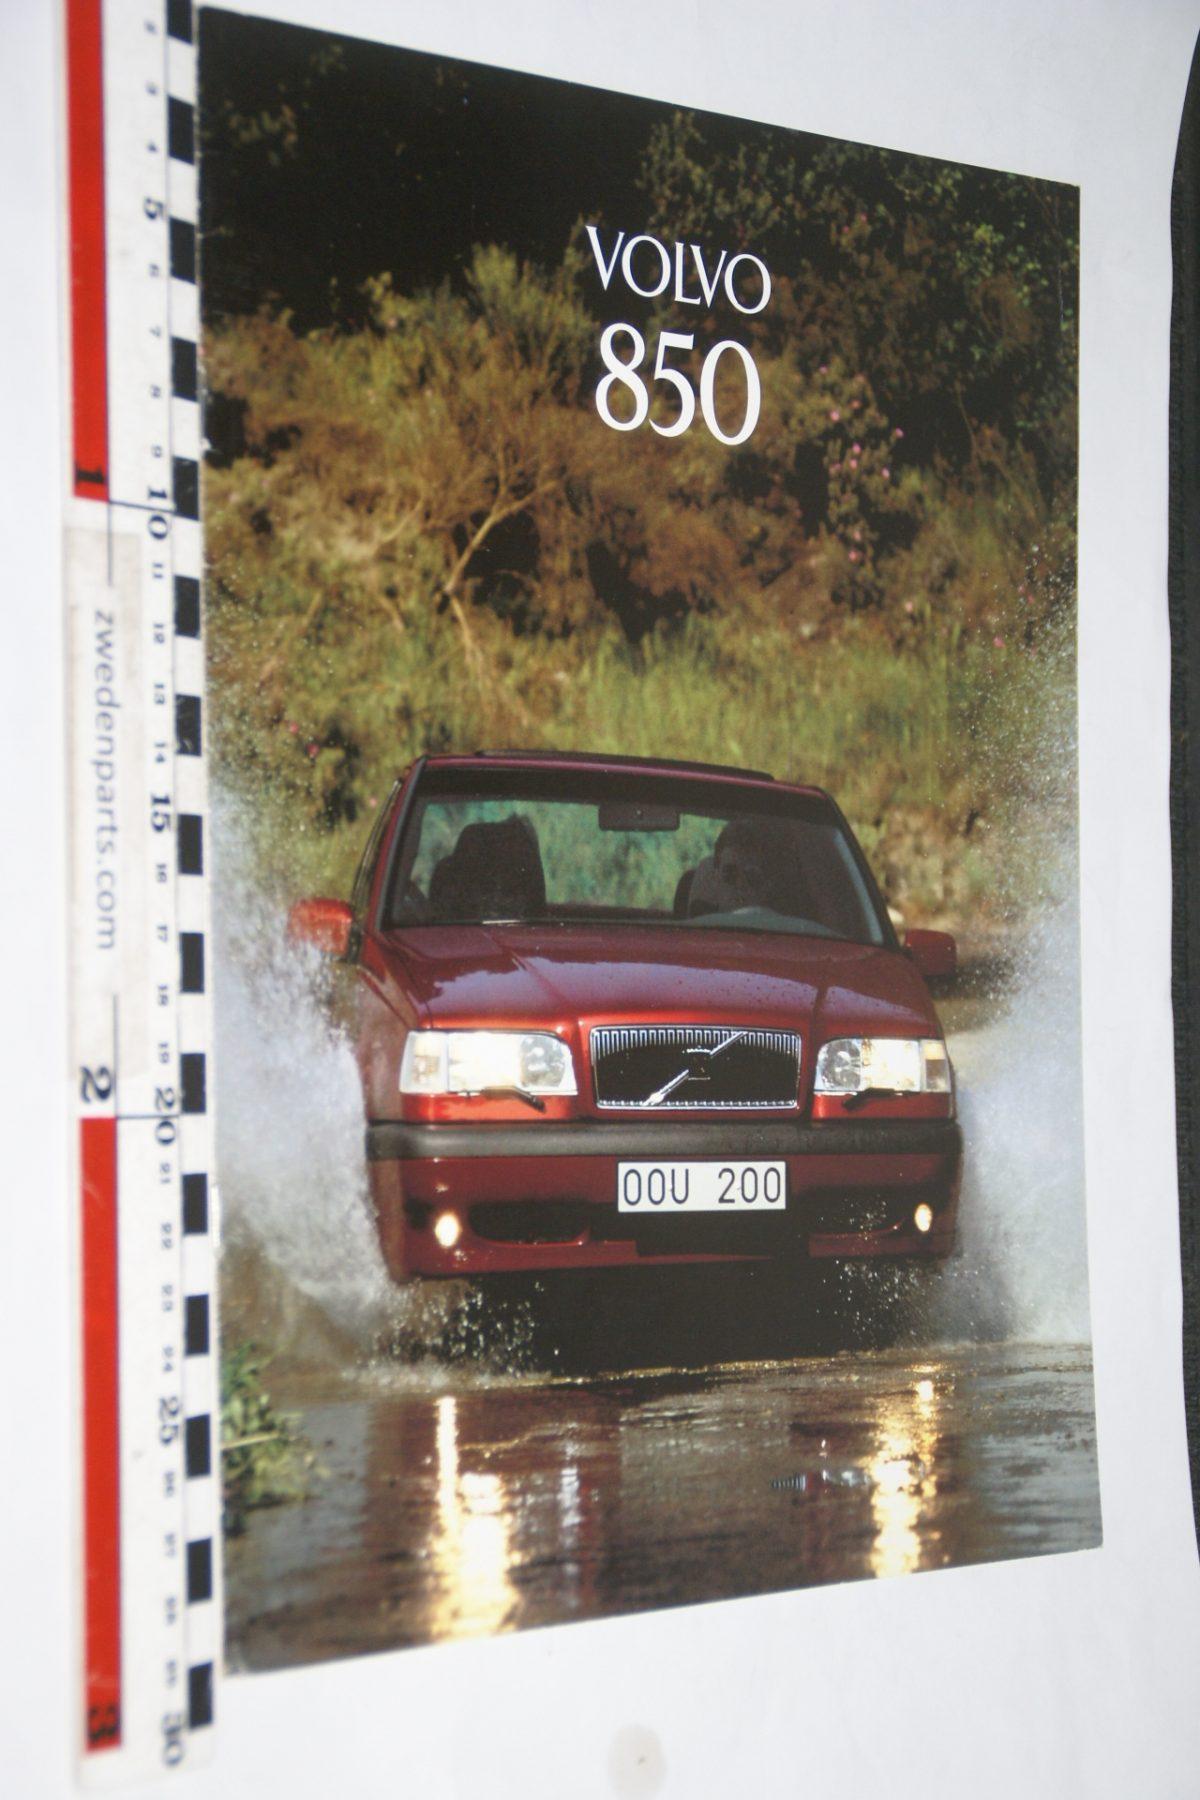 DSC06278 1995 brochure Volvo 850 nr MSPV 6551